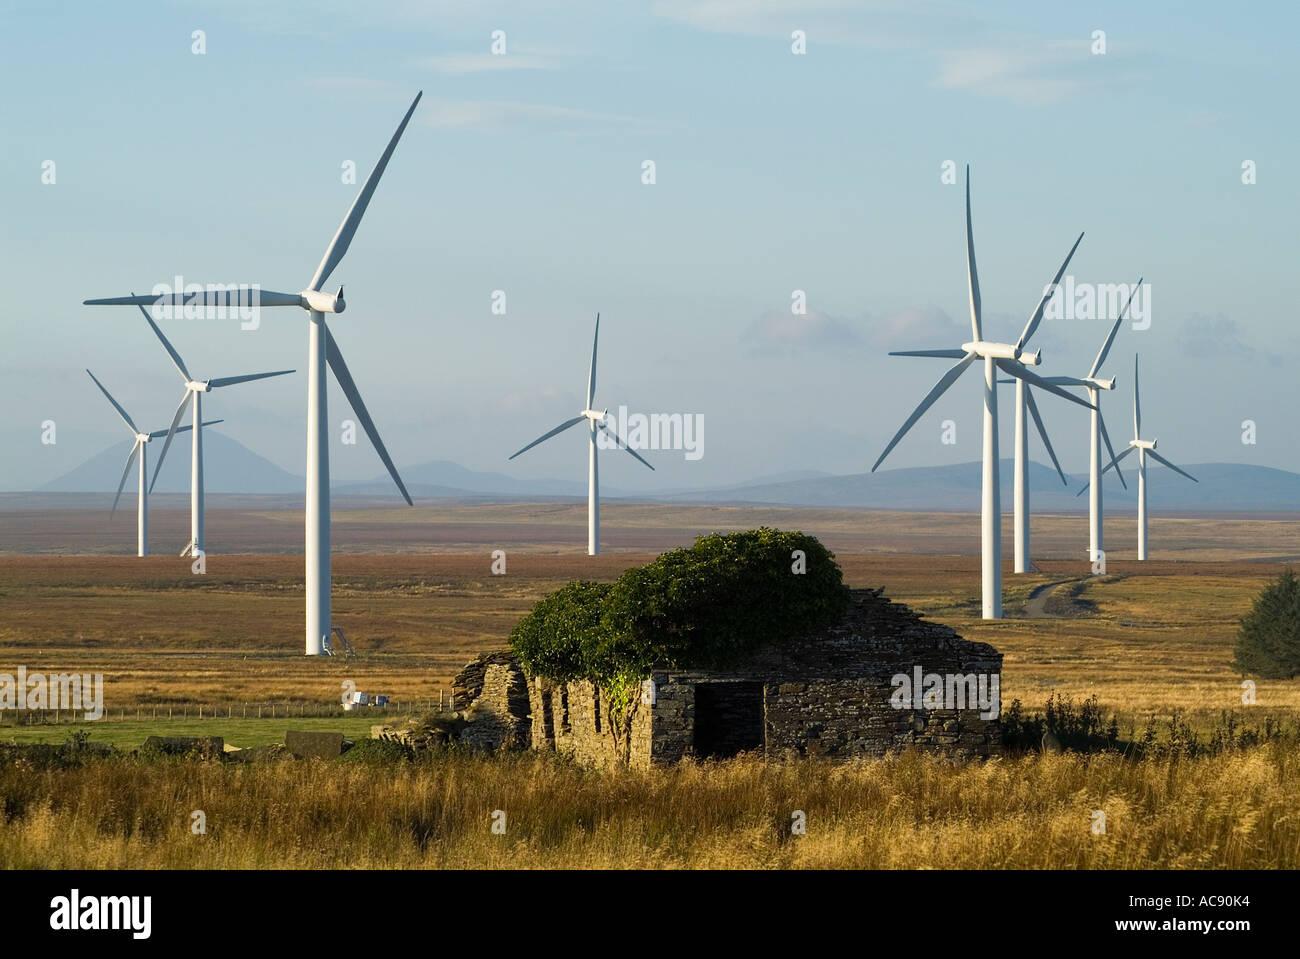 dh Causeymire Wind Farm NPOWER CAITHNESS Scottish Renewables energy RWE Turbine uk windfarm turbines windfarms flow country scotland renewable Stock Photo